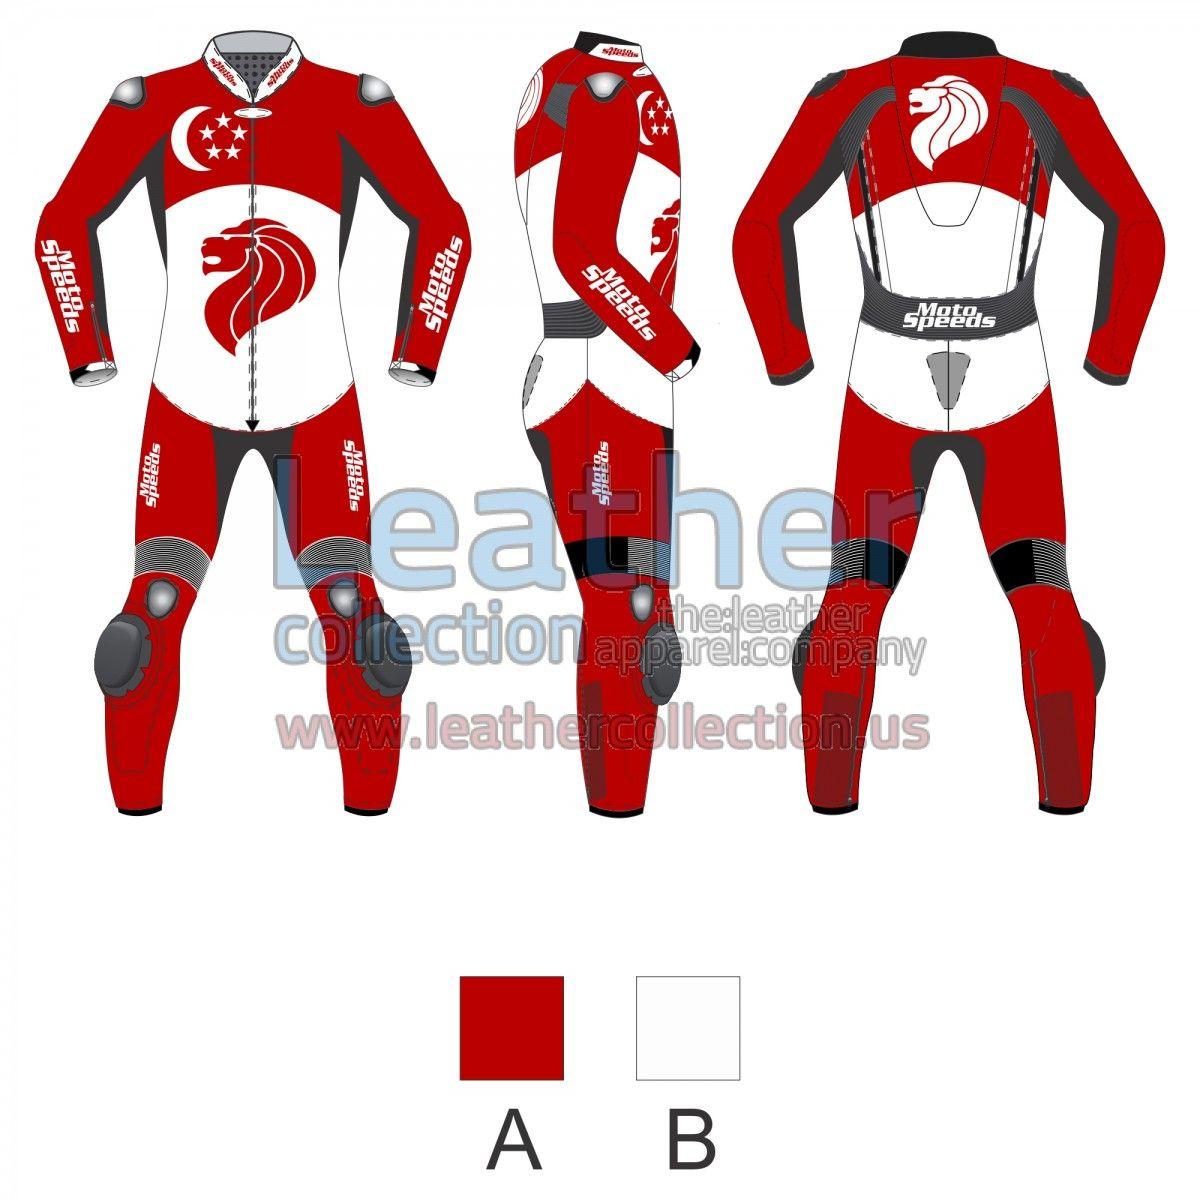 Singapore Flag Moto Suit - https://www.leathercollection.us/en-we/singapore-flag-moto-suit.html moto suit, Motorcycle suits #MotoSuit, #MotorcycleSuits